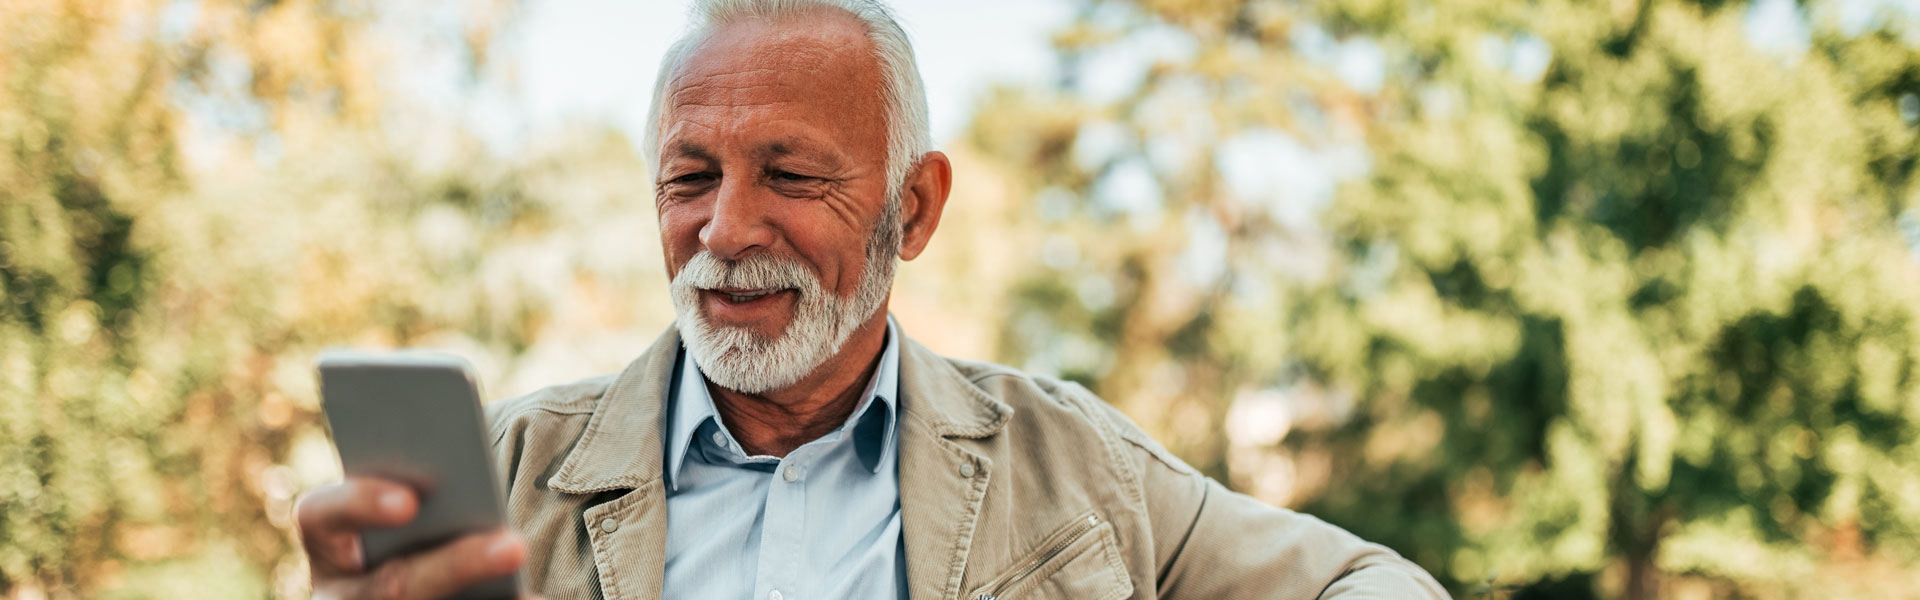 A senior man looking at his cell phone